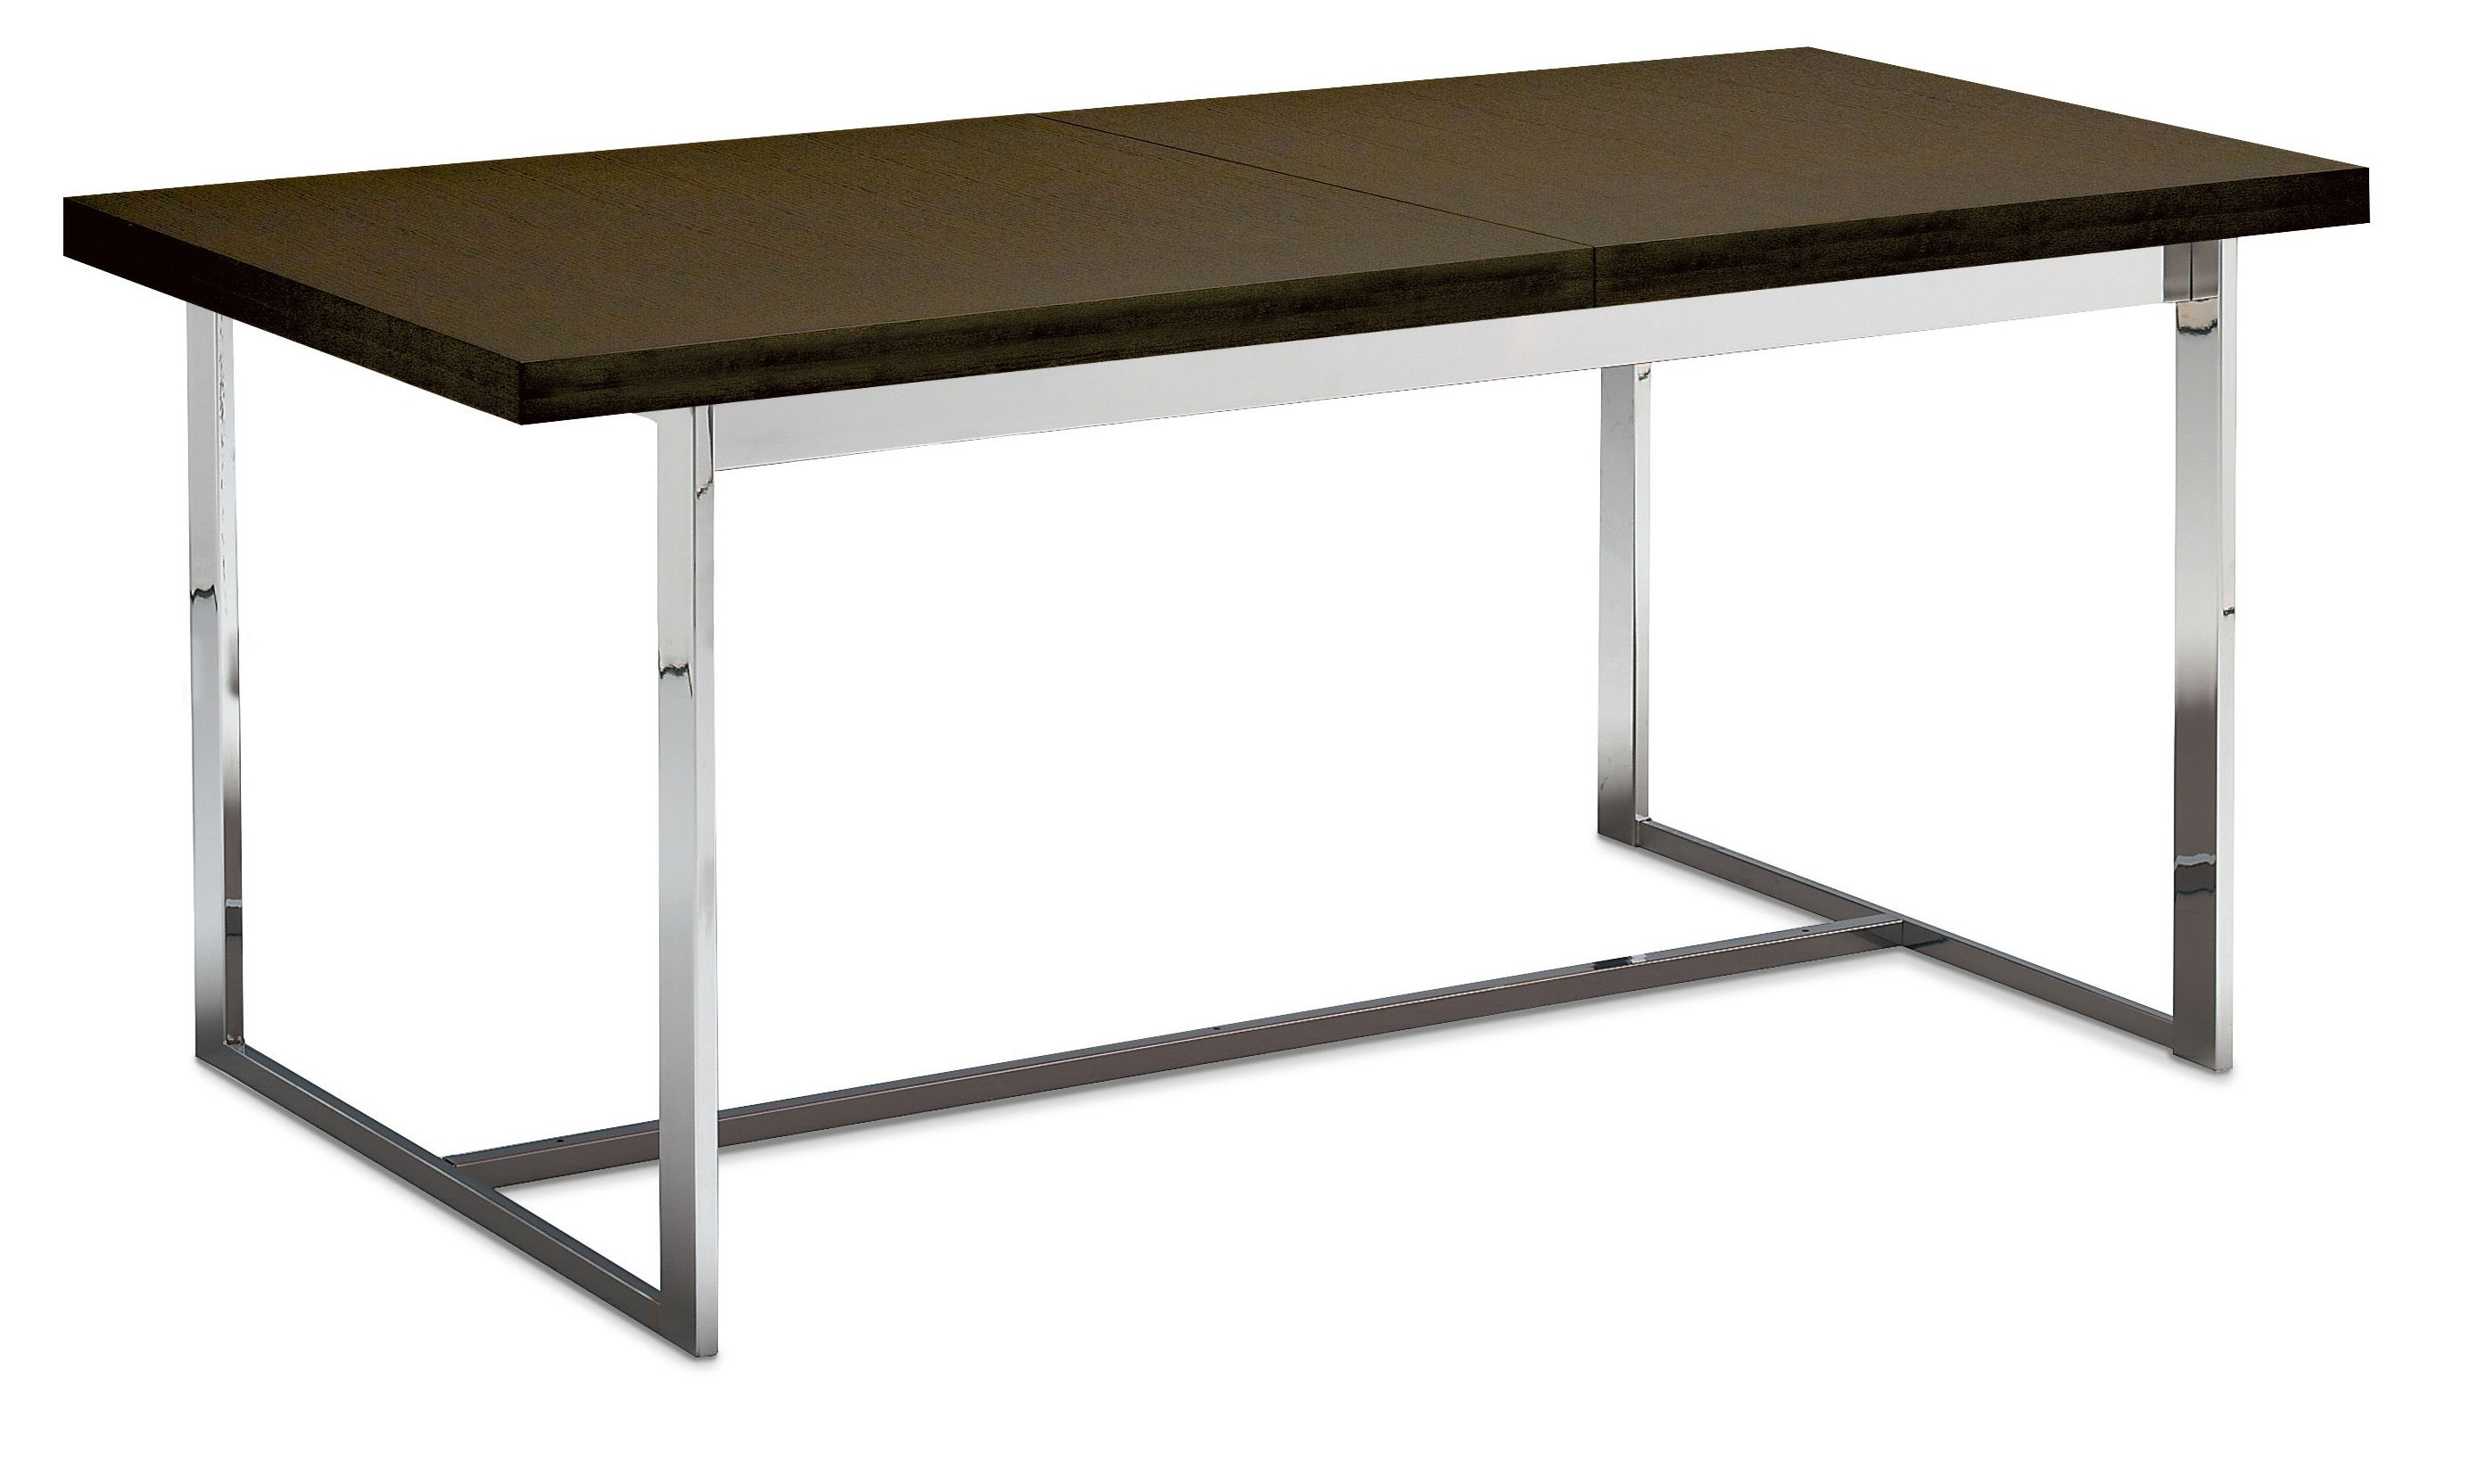 Domitalia Spice Dining Table Modern Furniture Decor Modern